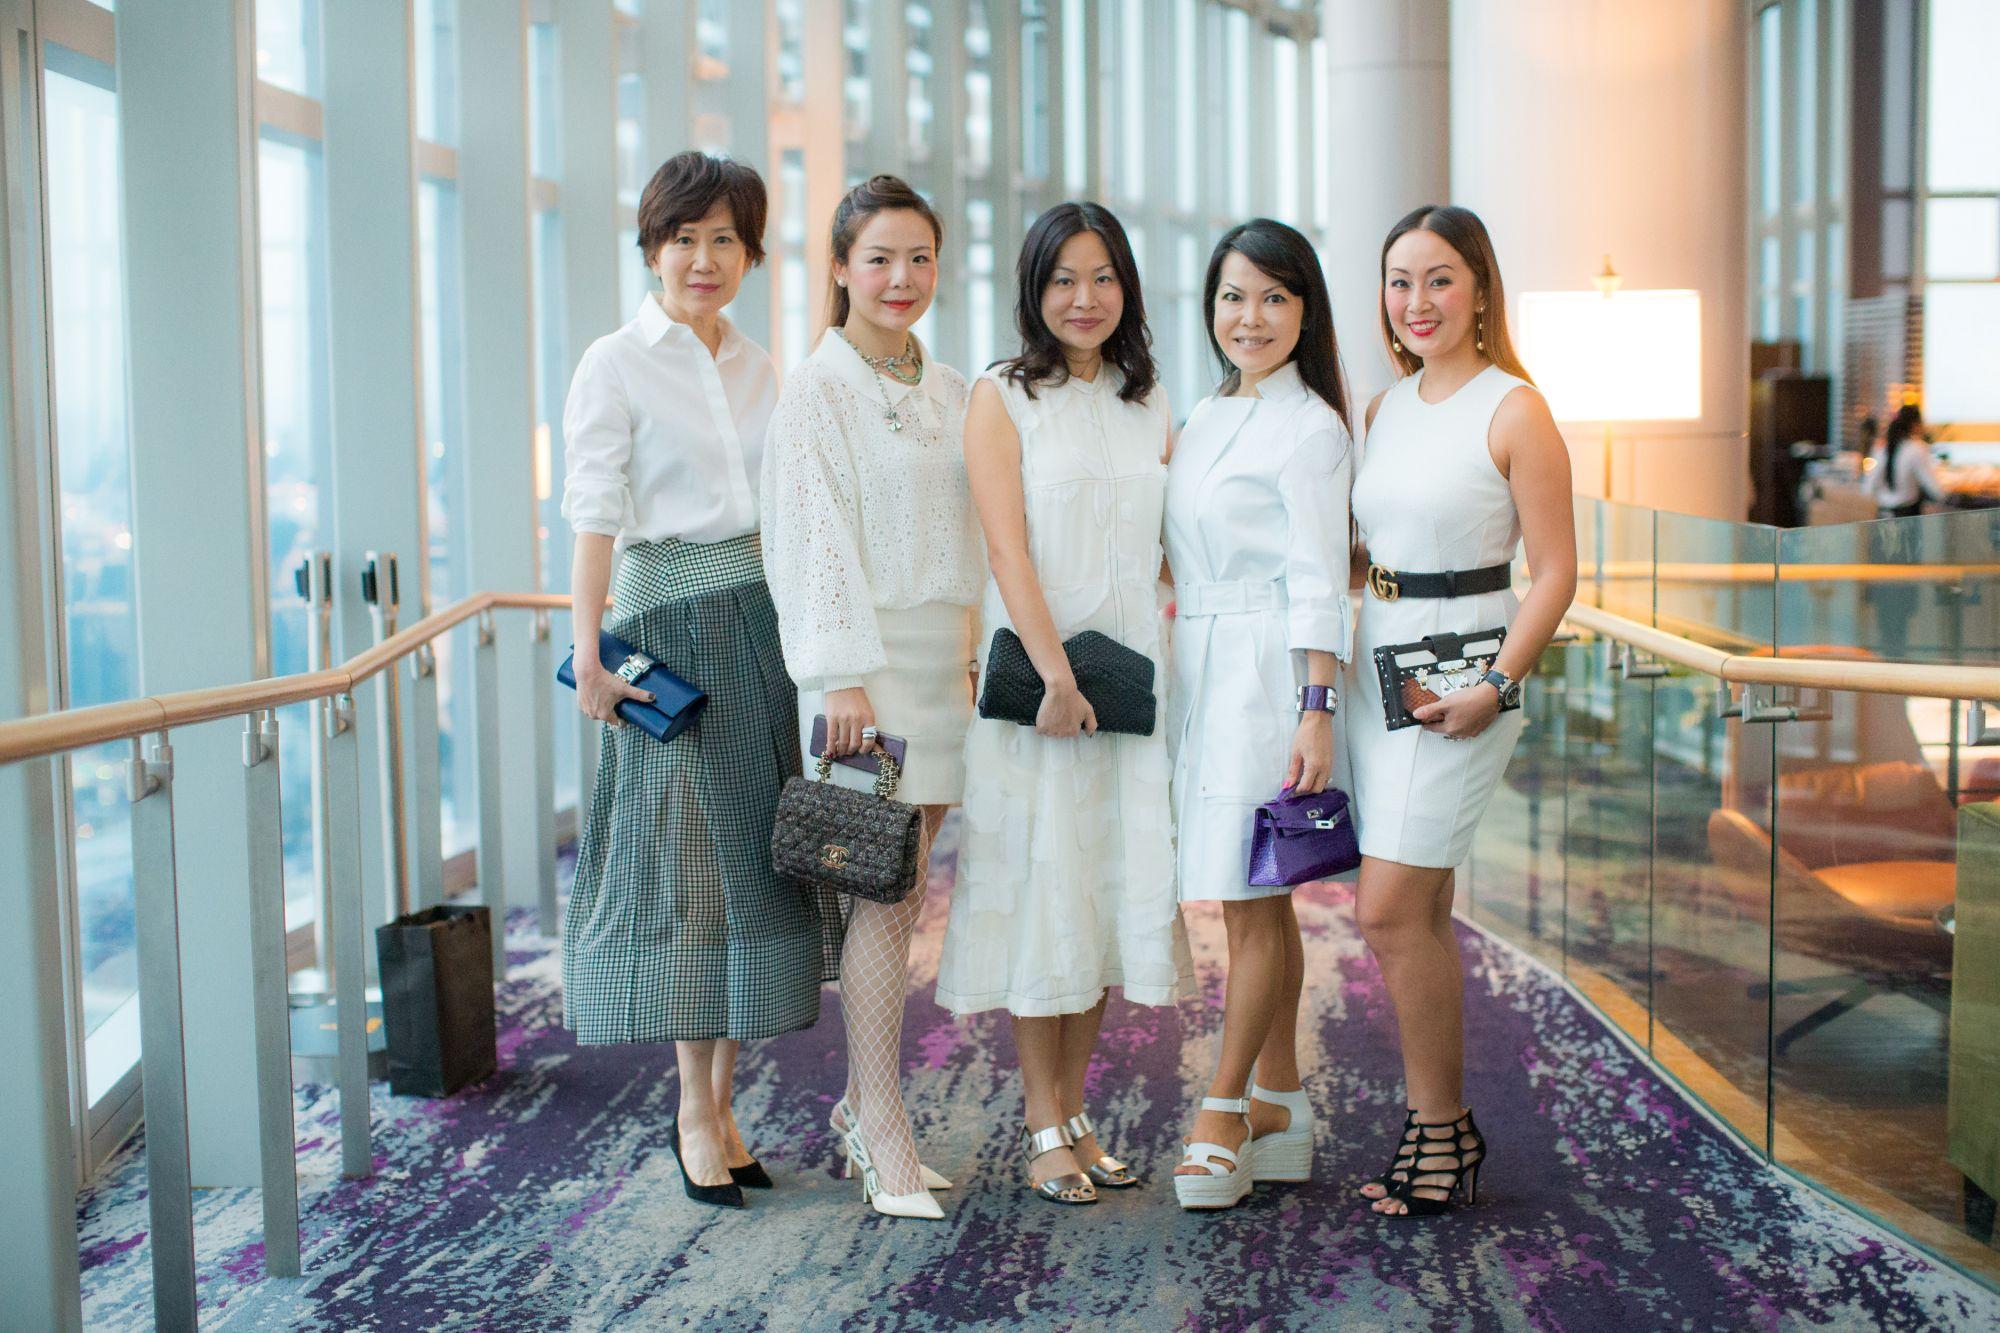 Nancy Ong, Andrea Chow, Sonia Ong, Kyoko Abe, Serene Chua